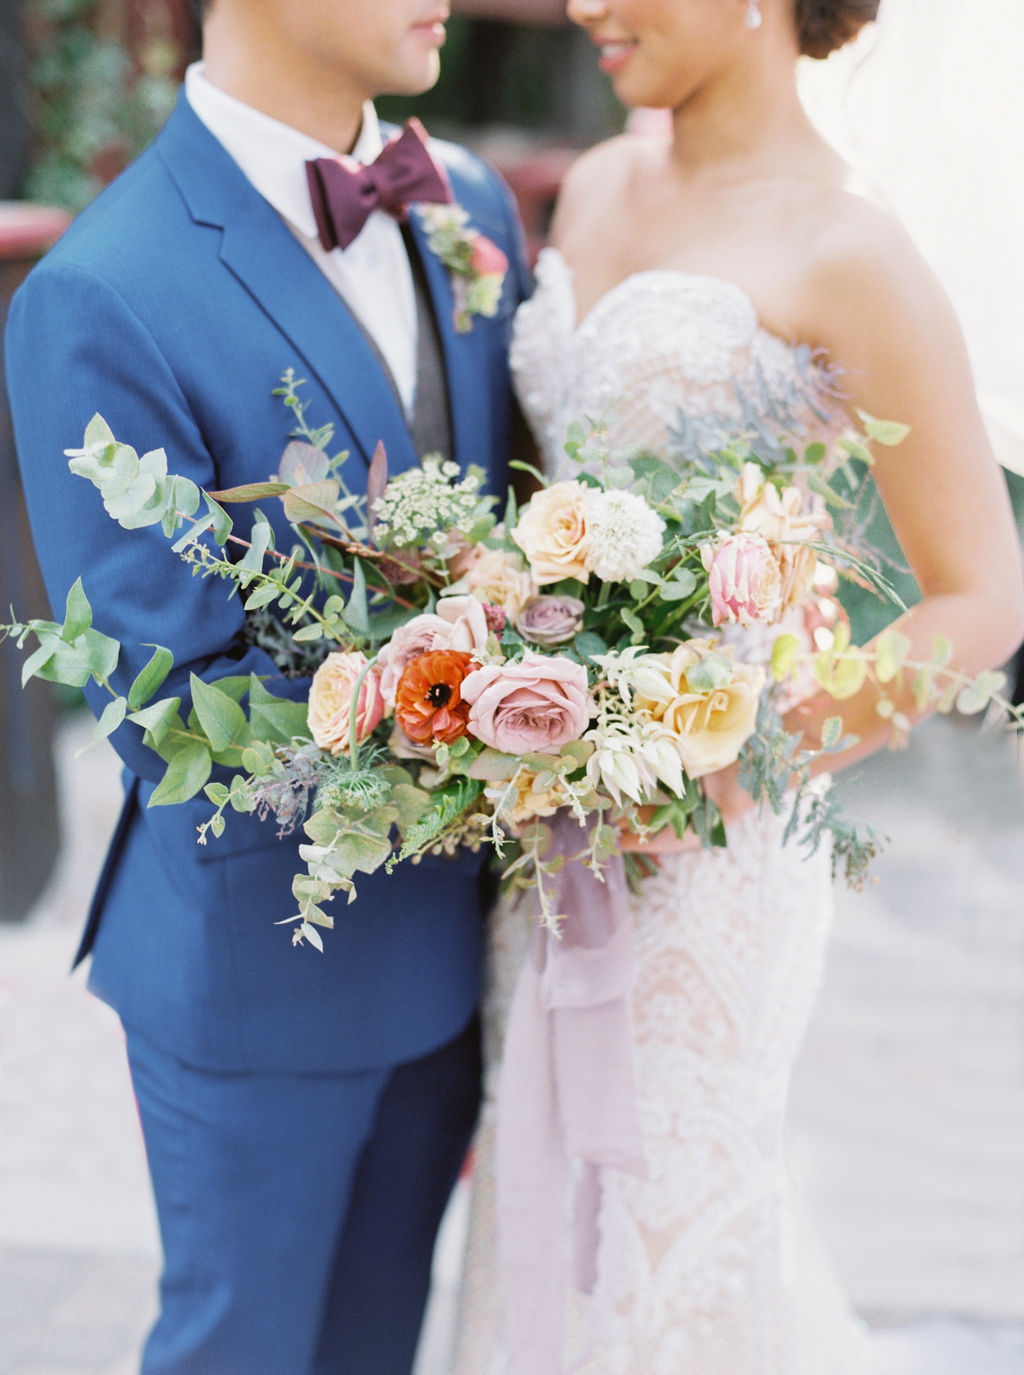 Bridal Bouquet by Megan Wise